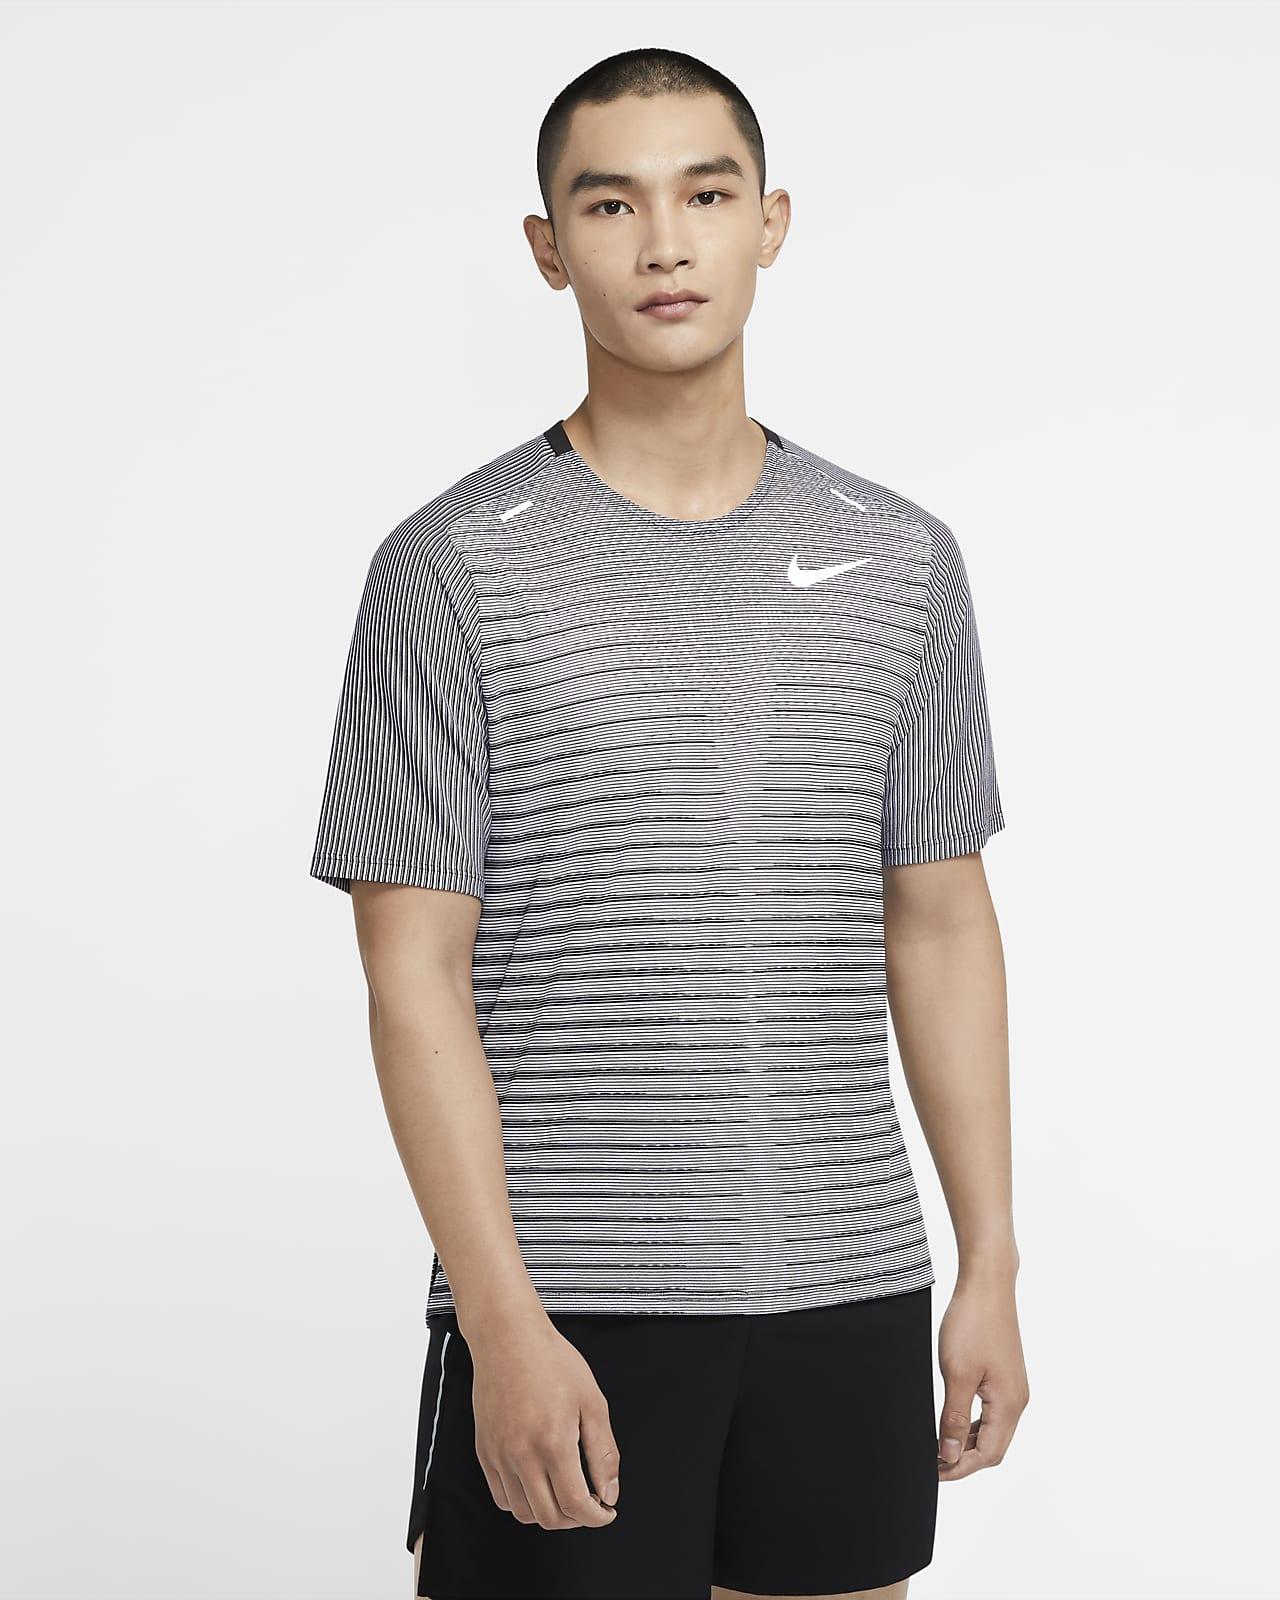 Nike TechKnit Future Fast Men's Running Top